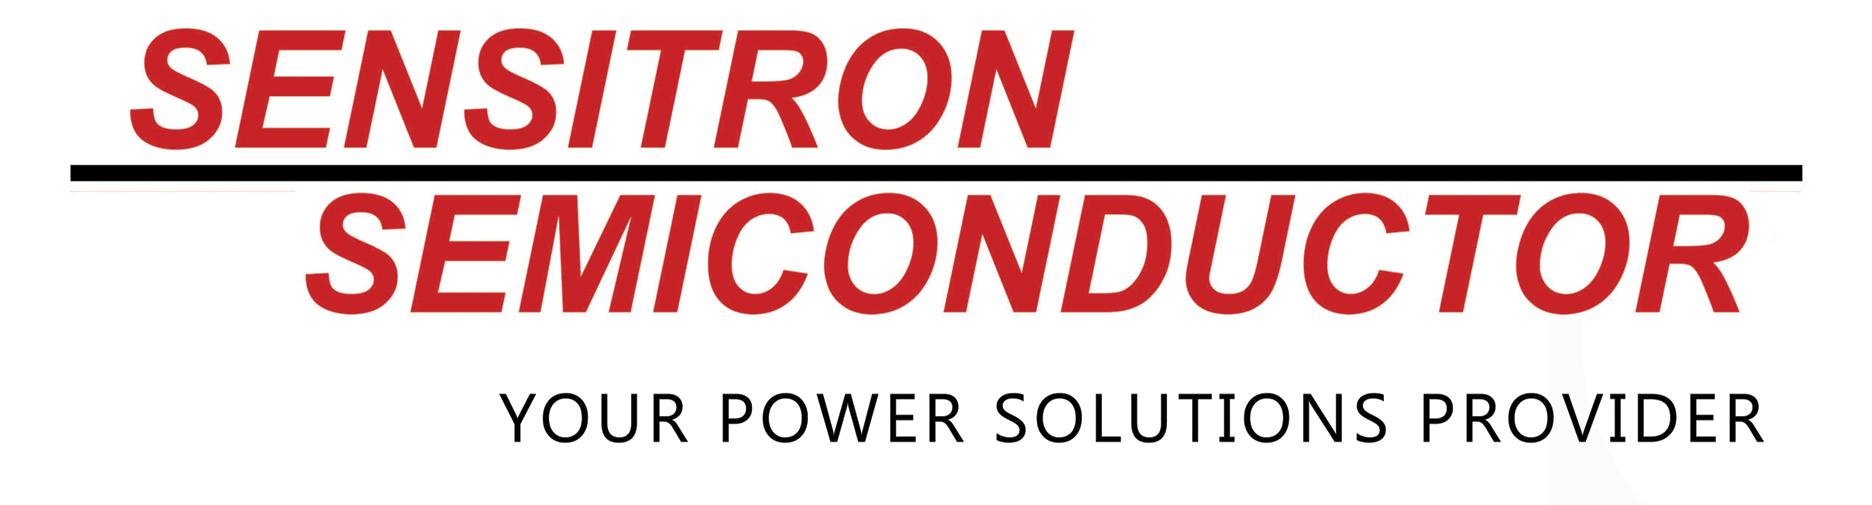 Sensitron logo